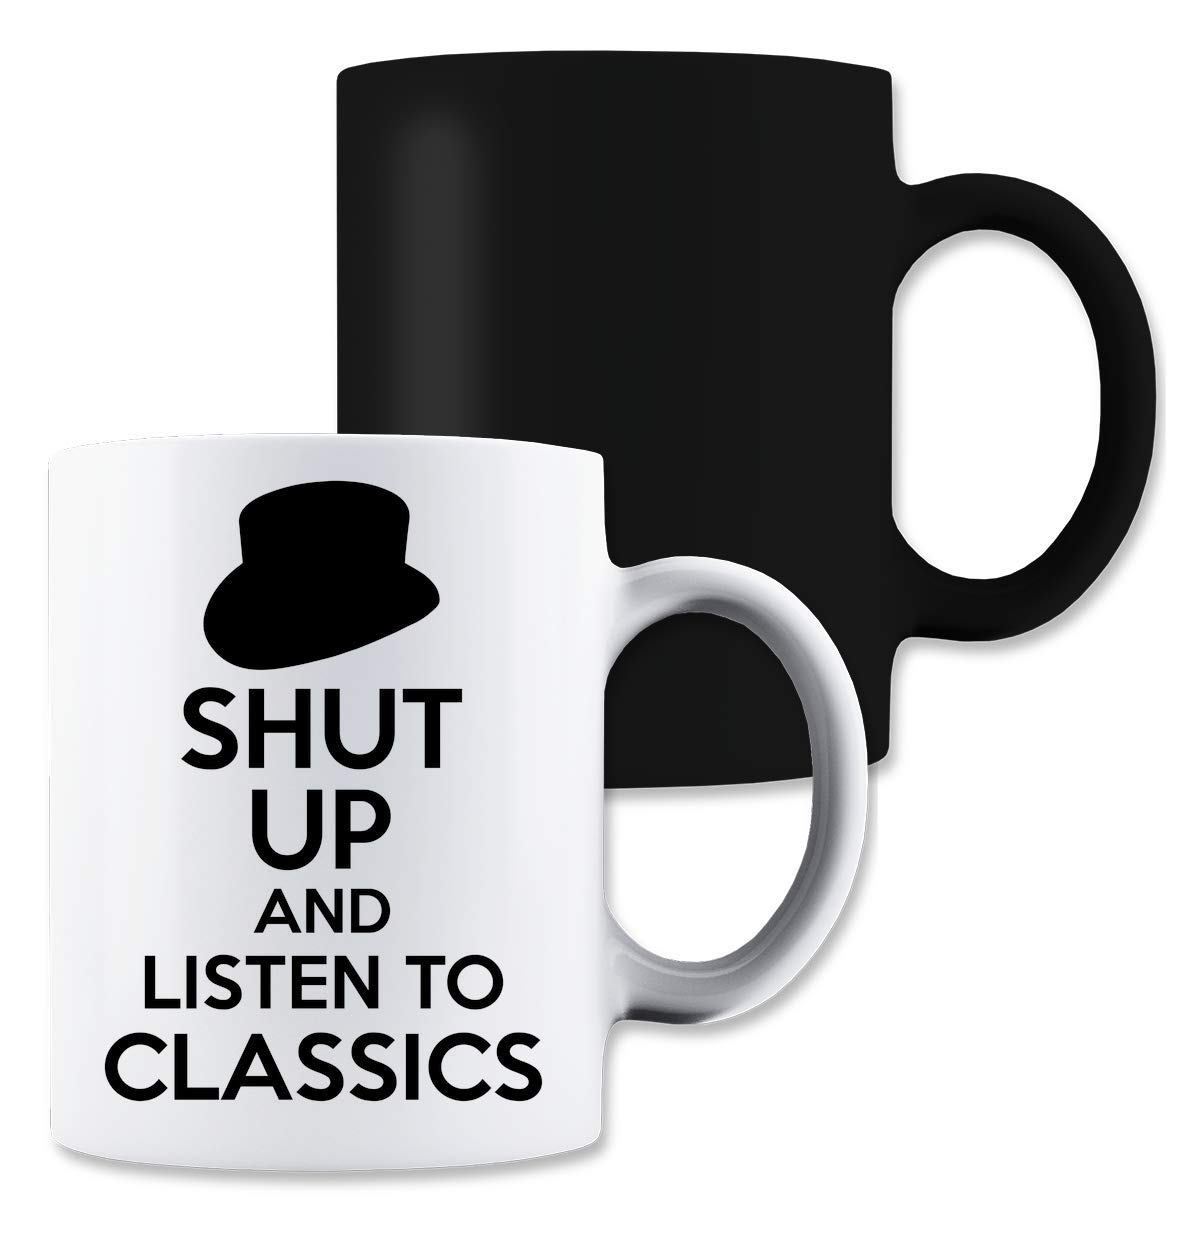 ShutUp and Listen to Classics Magische Tee-Kaffeetasse